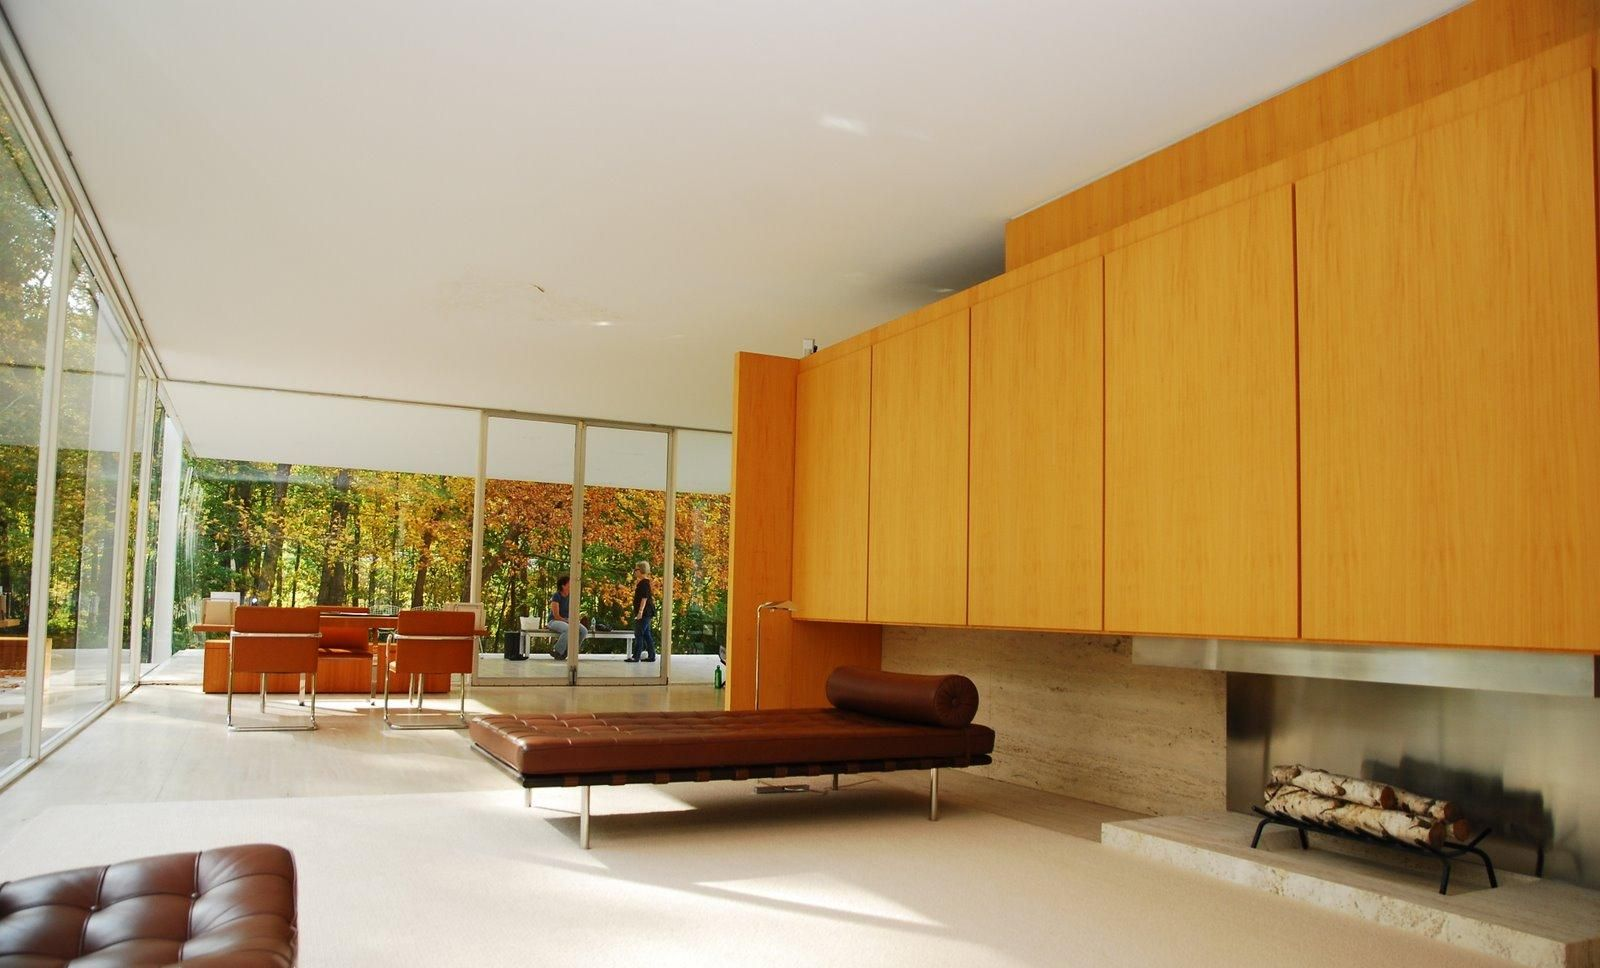 Mies van de Rohe Farnsworth House Interior Modern Architecture